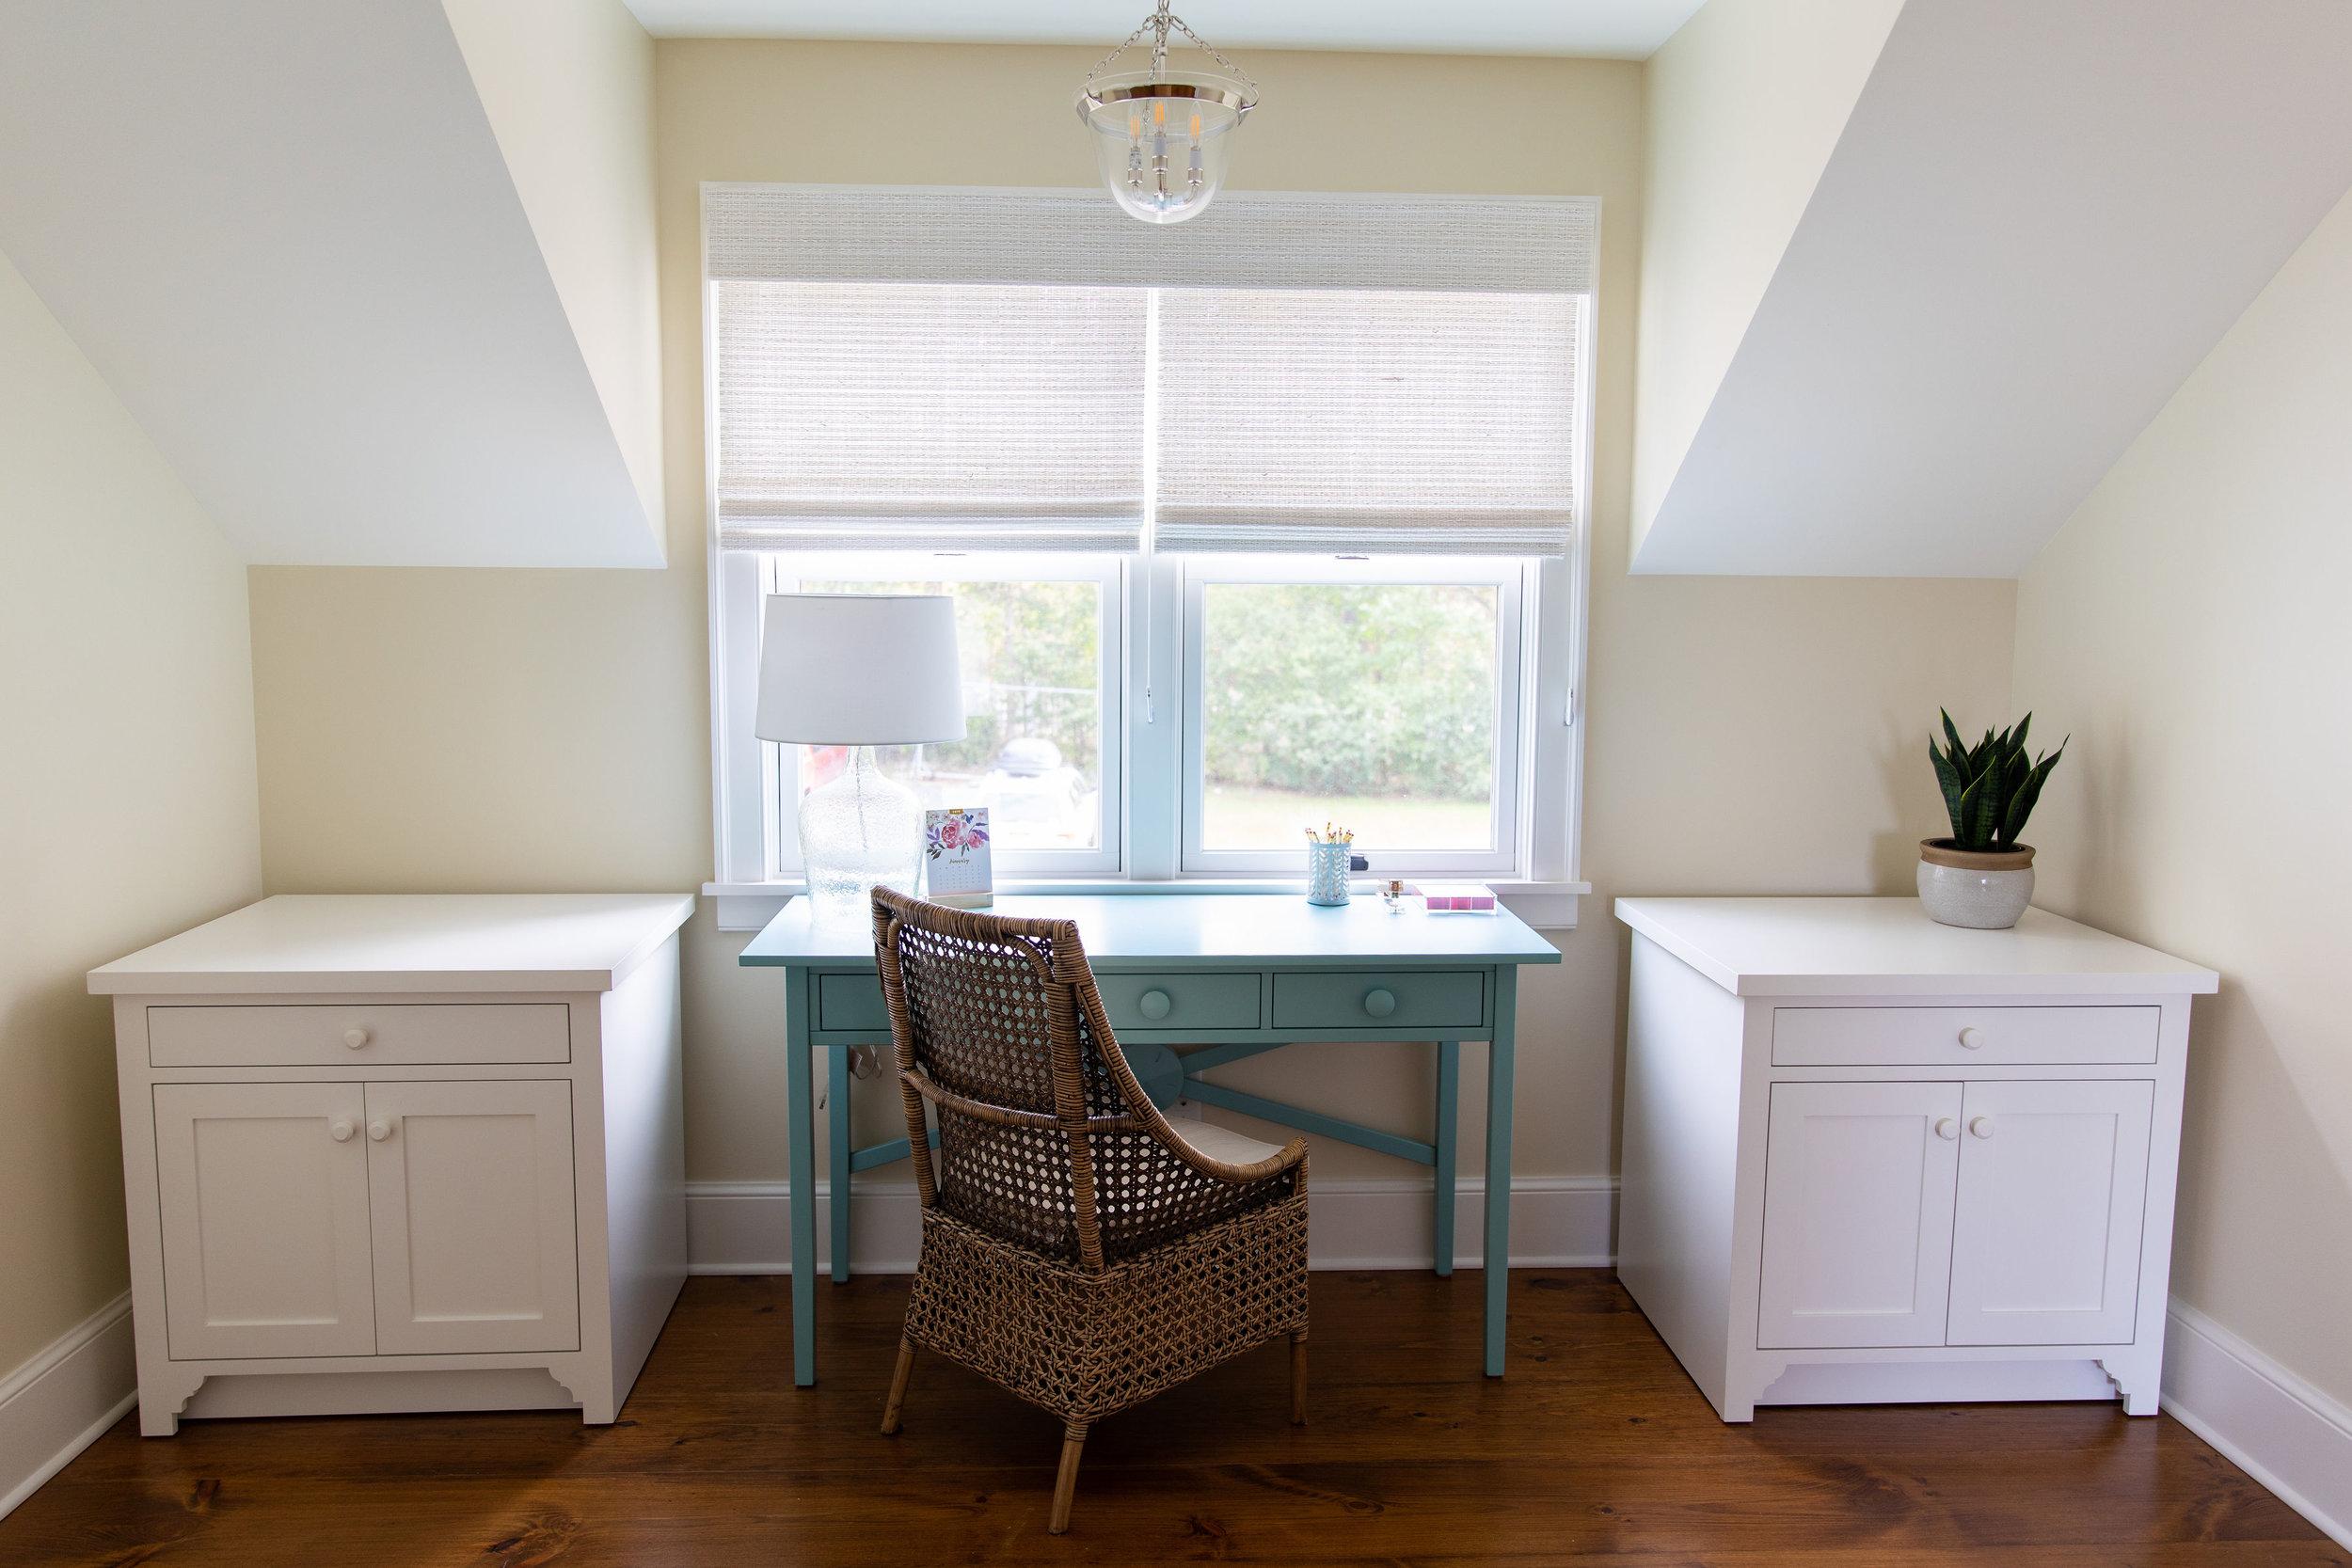 Small house interior design, Skaneateles, NY interior designer, Teaselwood Design